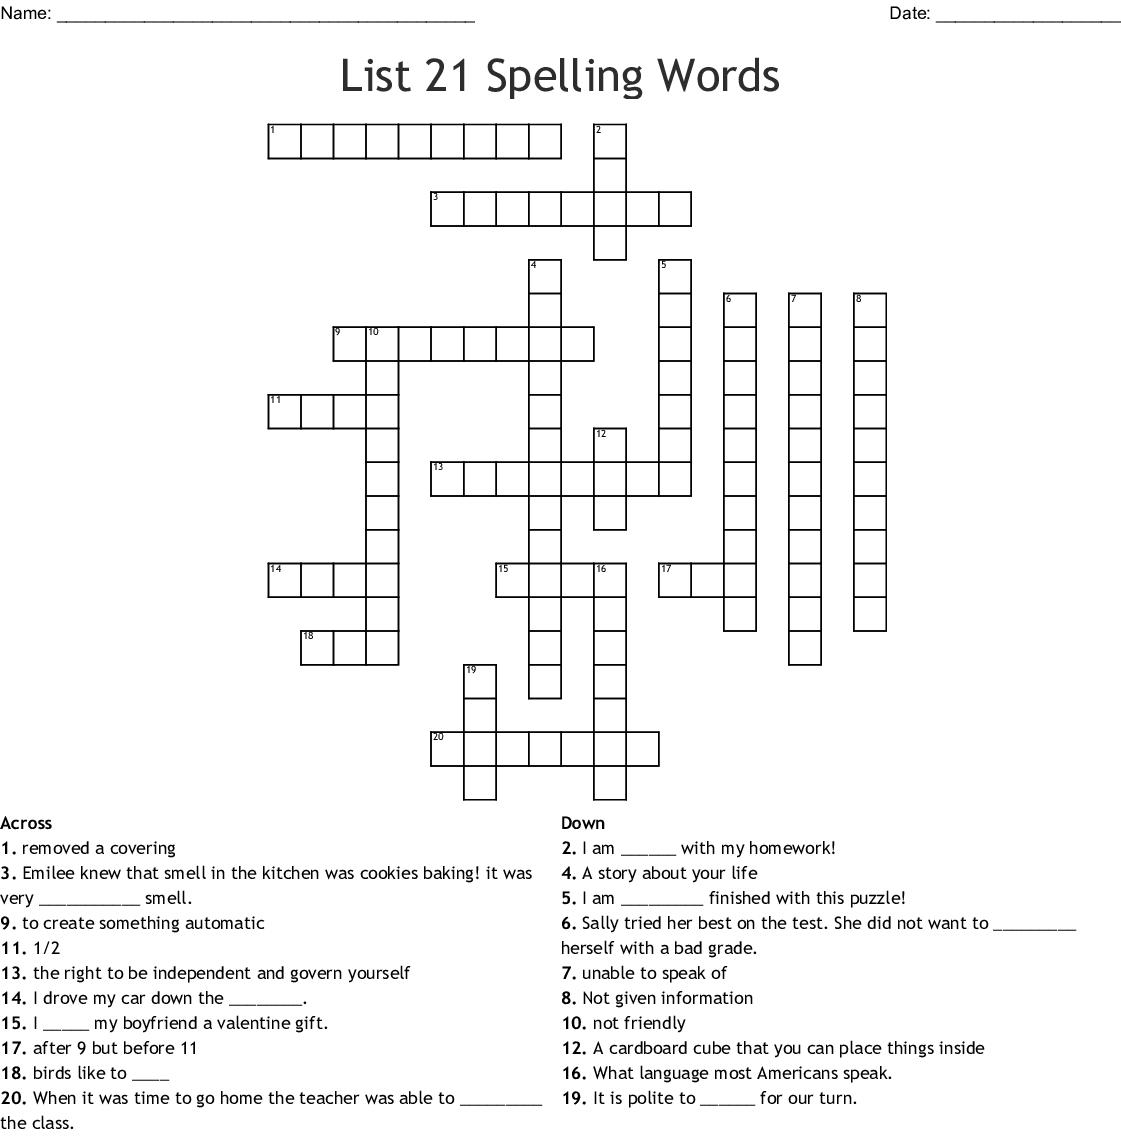 List 21 Spelling Words Crossword